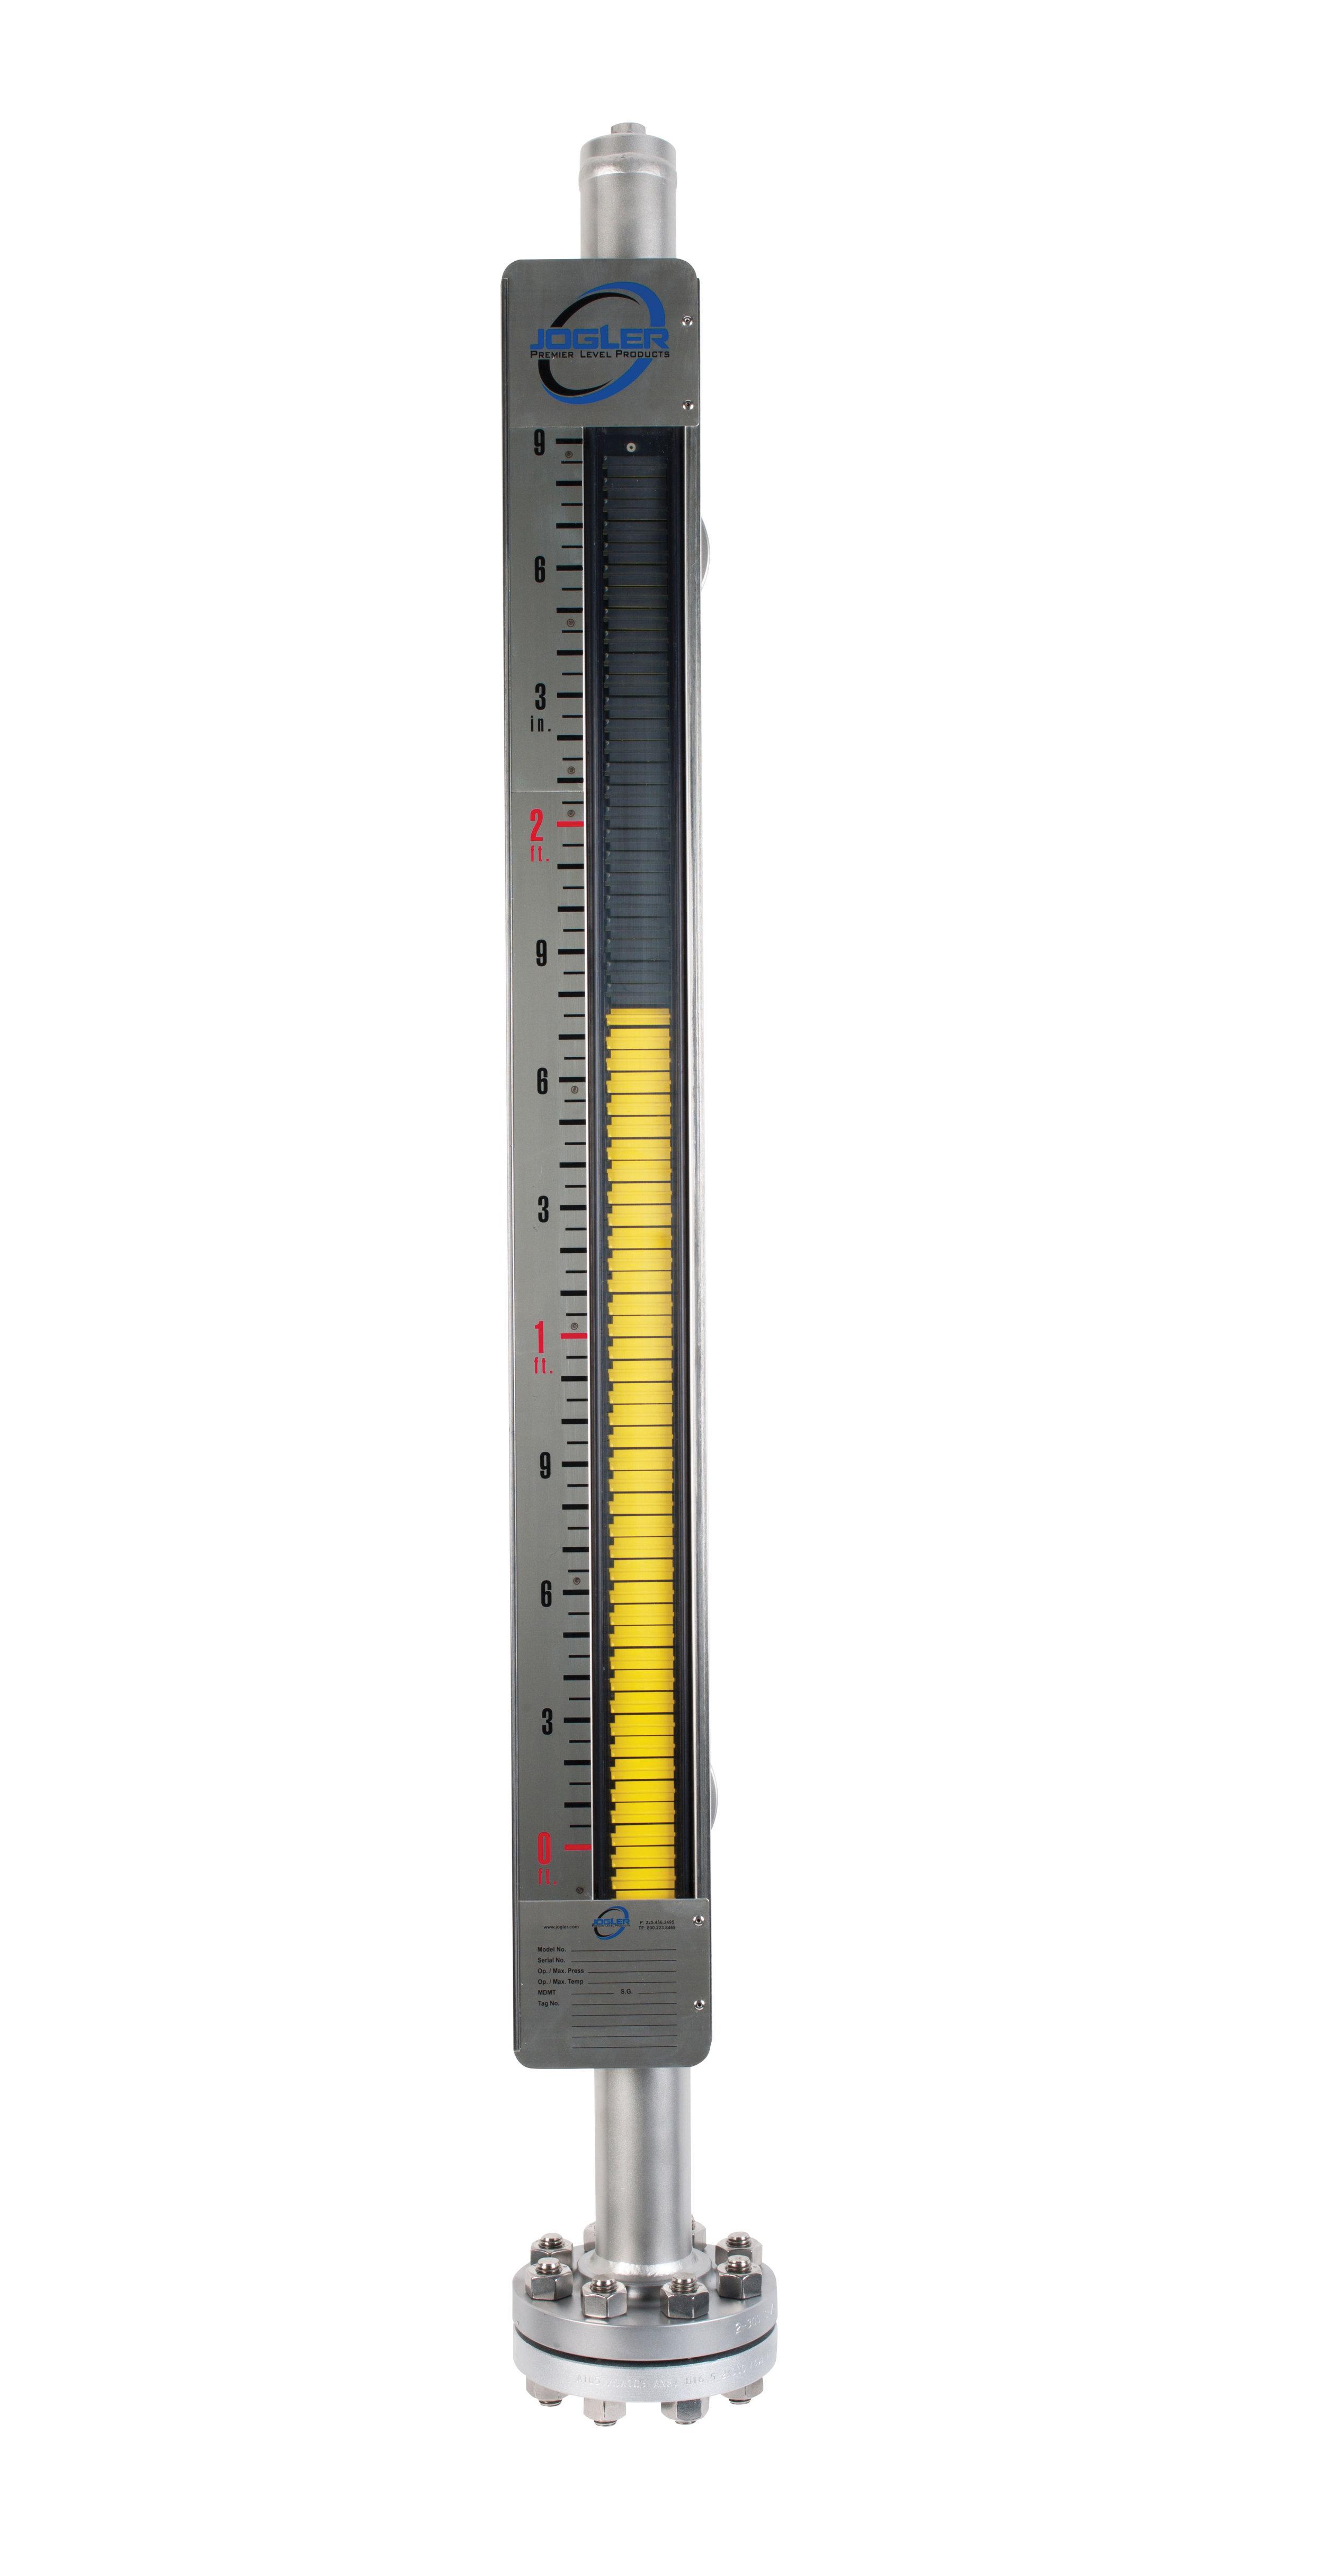 JMG-series Magnetic Level Gauge